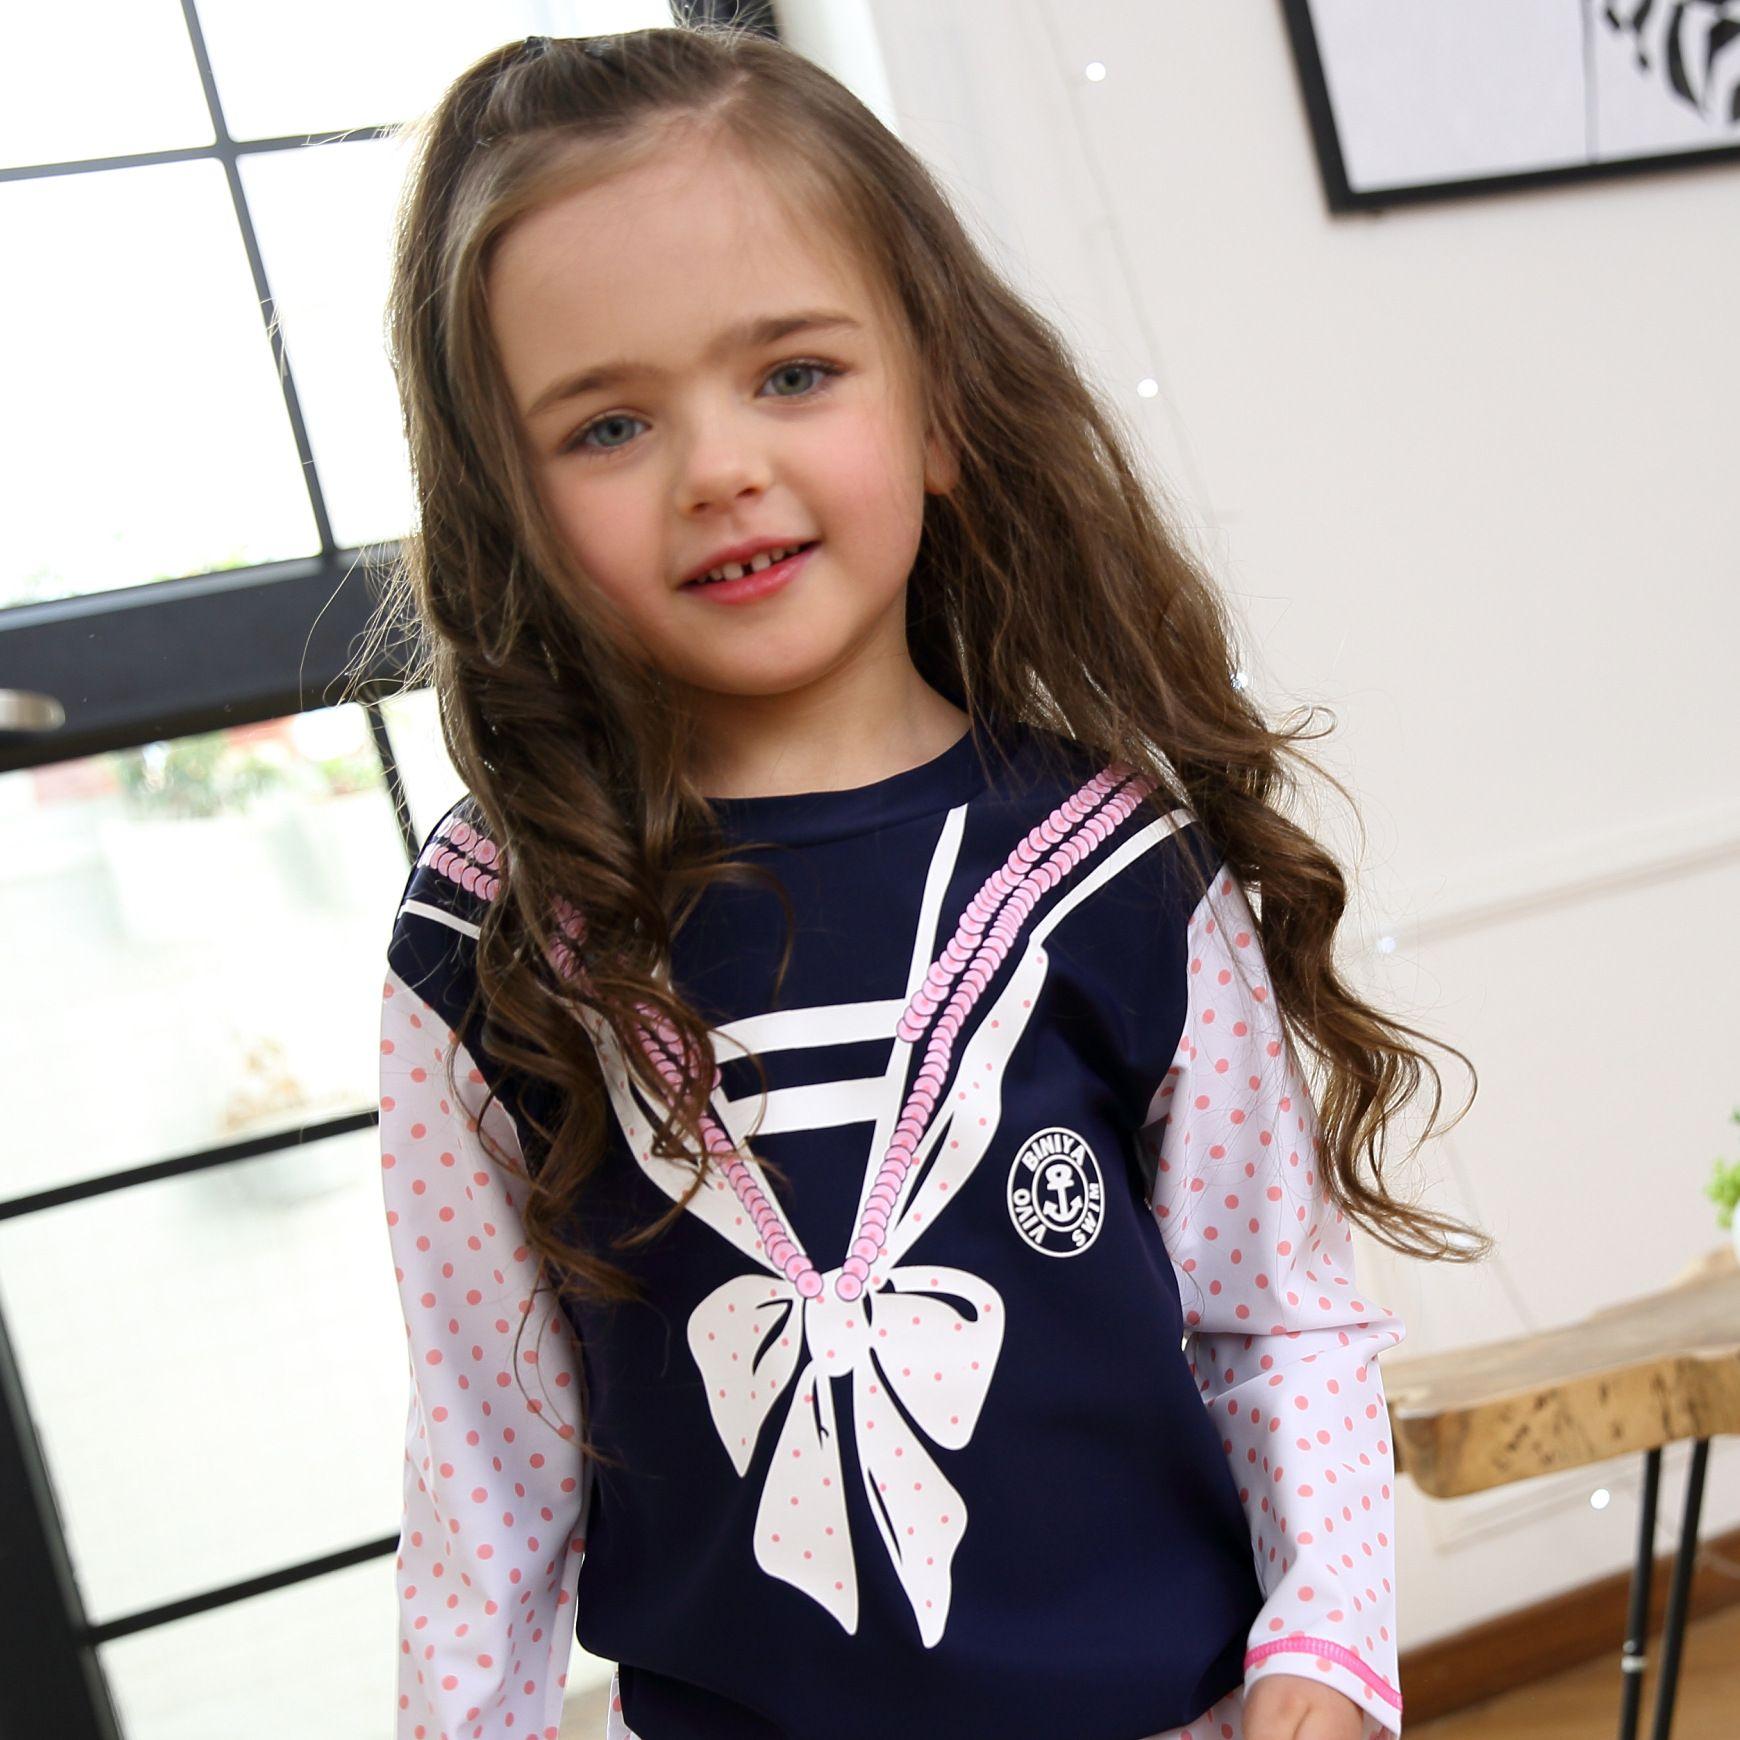 105d7e9405e8f 2019 2018 Brand New Children Girls Long Sleeve Swimsuit UV Proof Quick Dry Swimwear  Highly Elastic Comfortable Swimsuit Blue From Minniehoney, ...